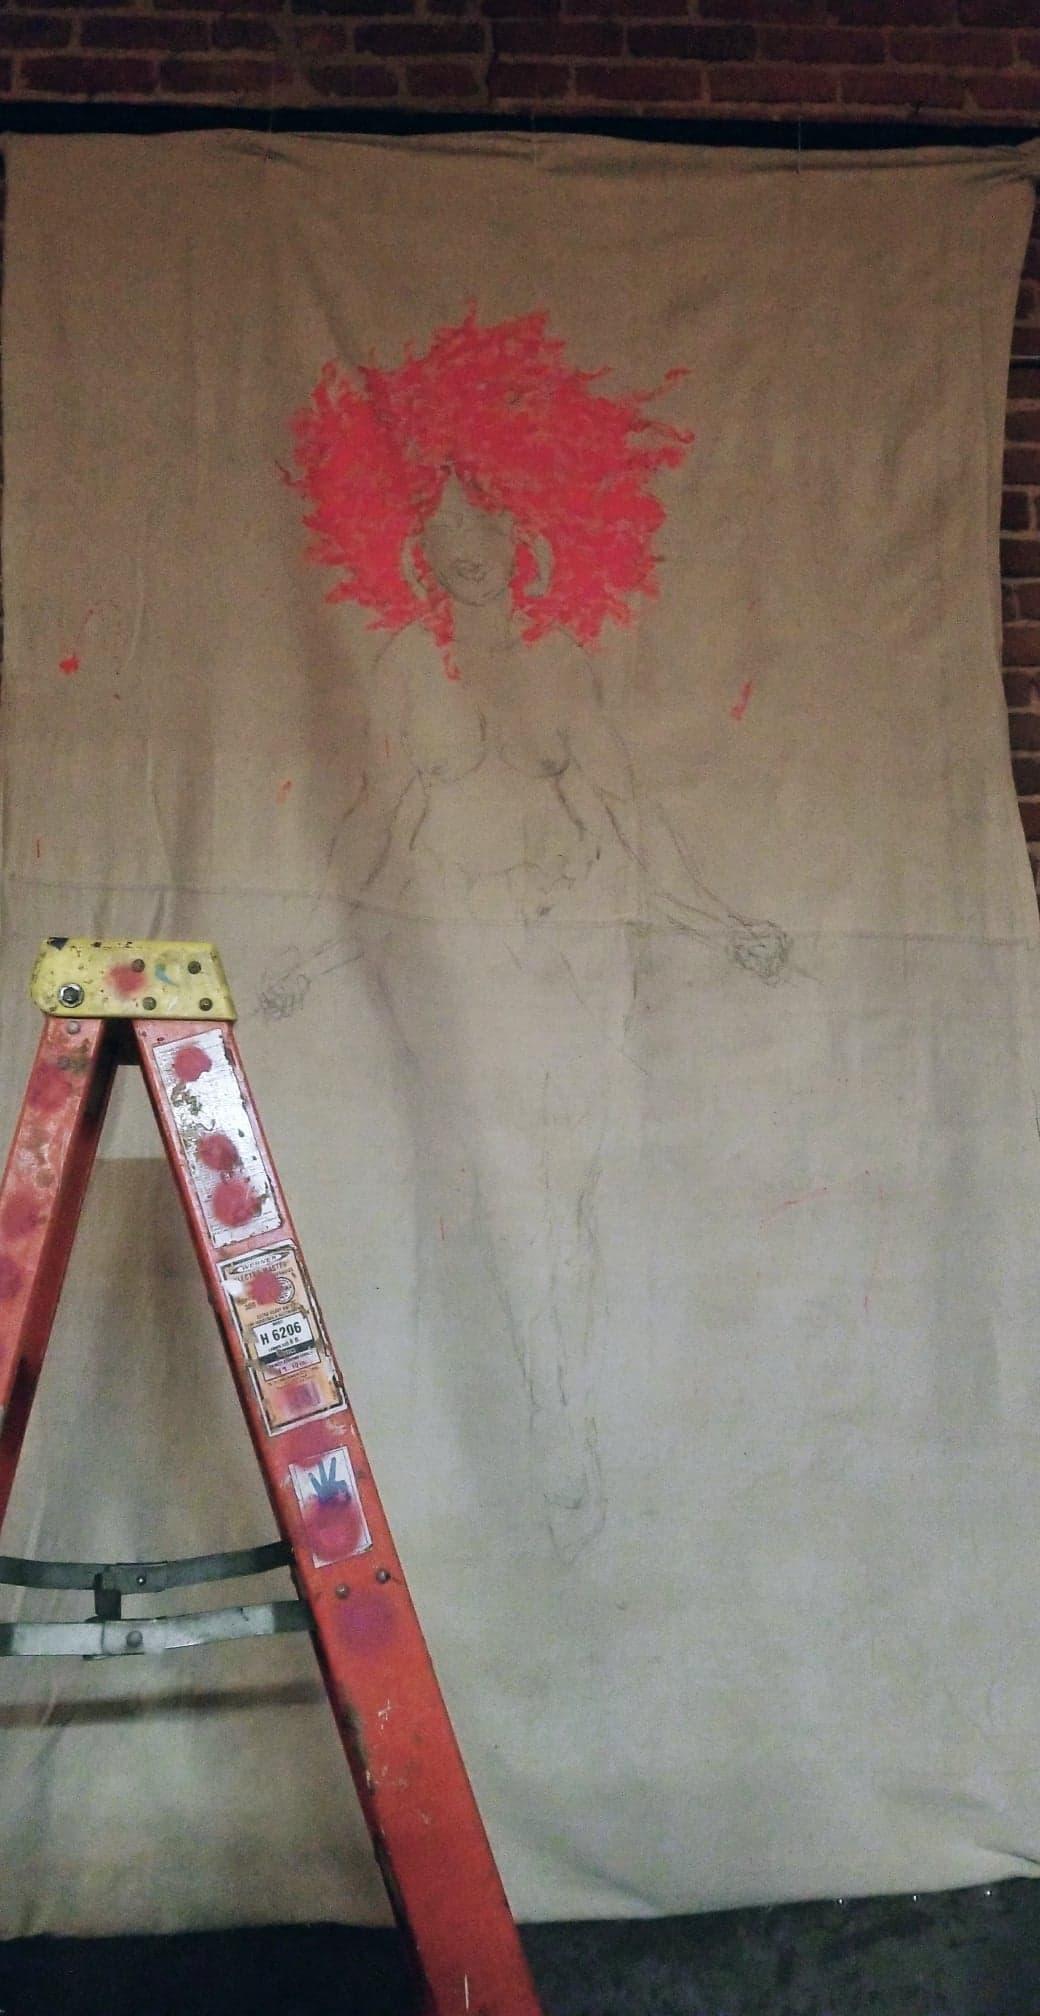 4 Live Painting In Progress By Lajon Miller.jpg